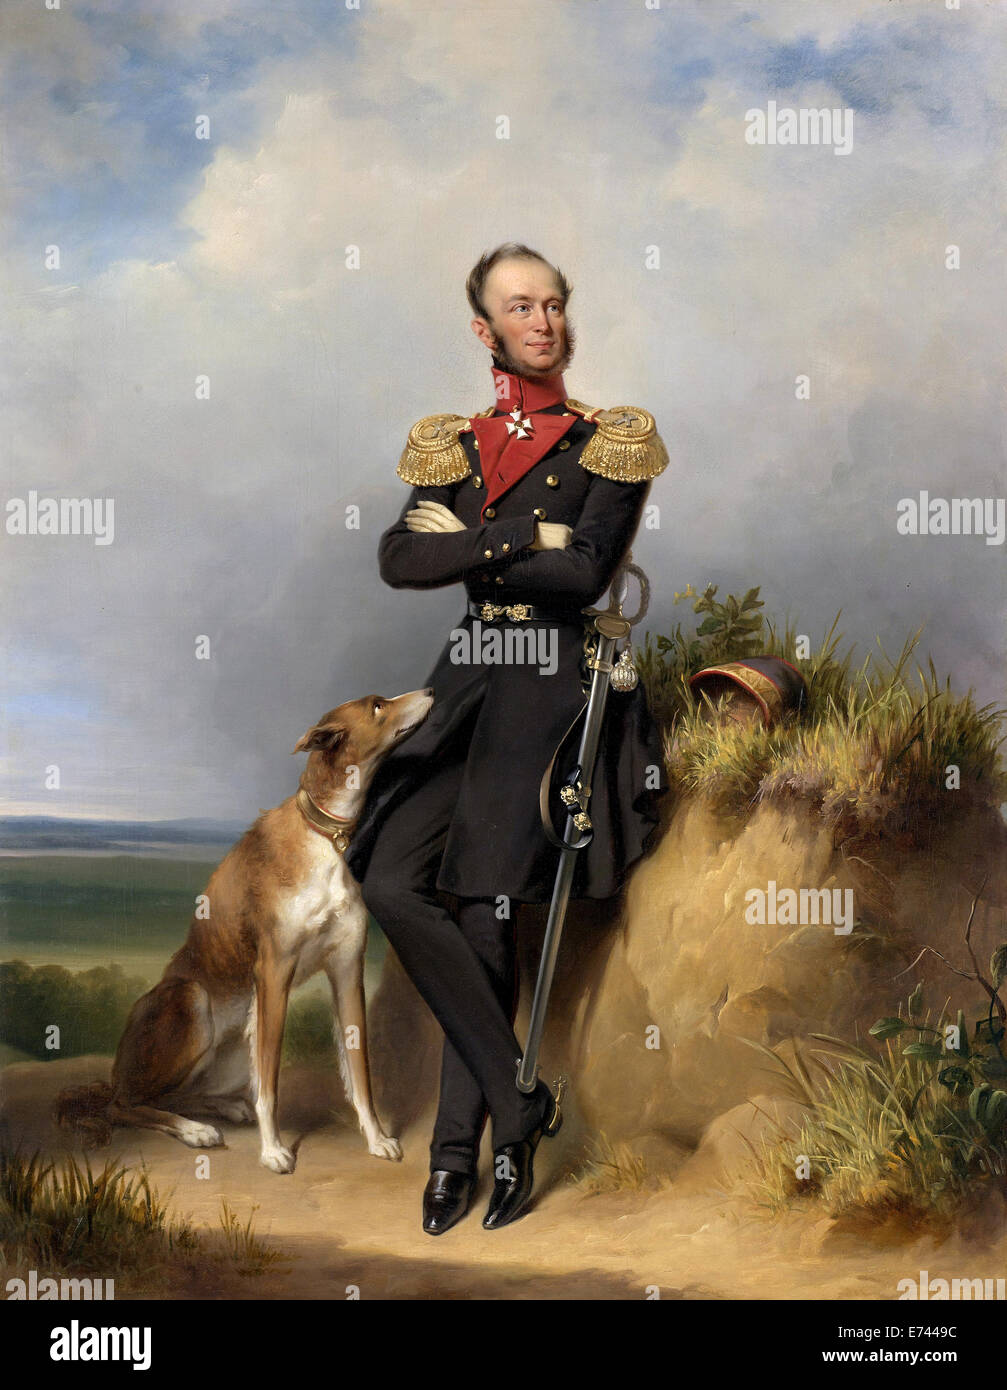 Portrait of William II, King of the Netherlands - by Jan Adam Kruseman, 1839 - Stock Image